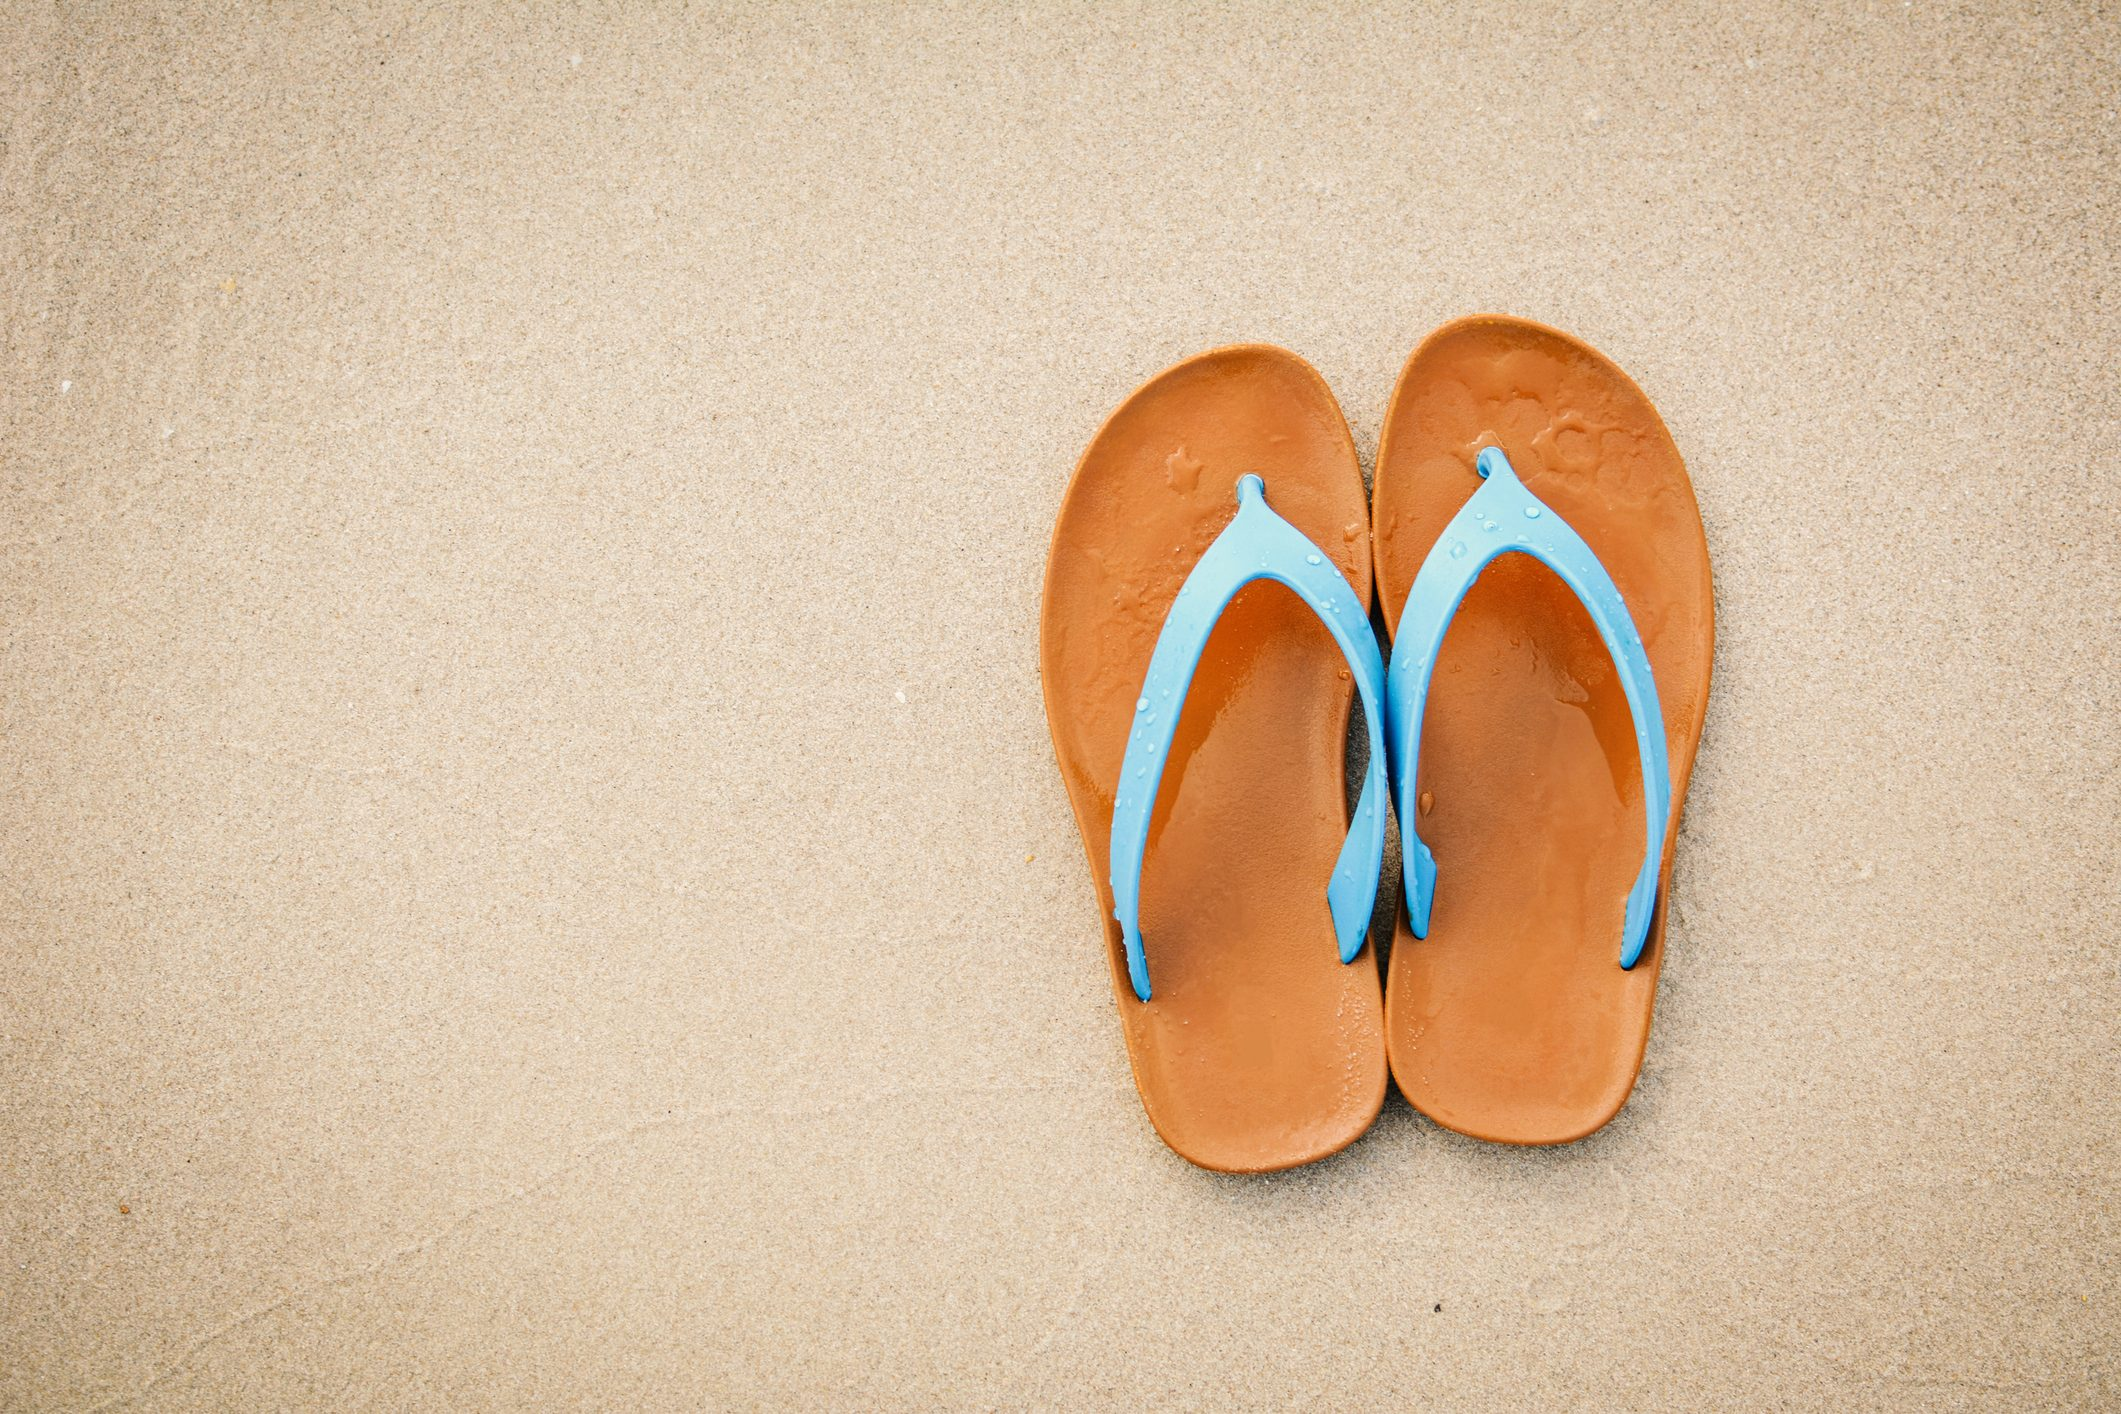 flip flops shot from above on sand beach